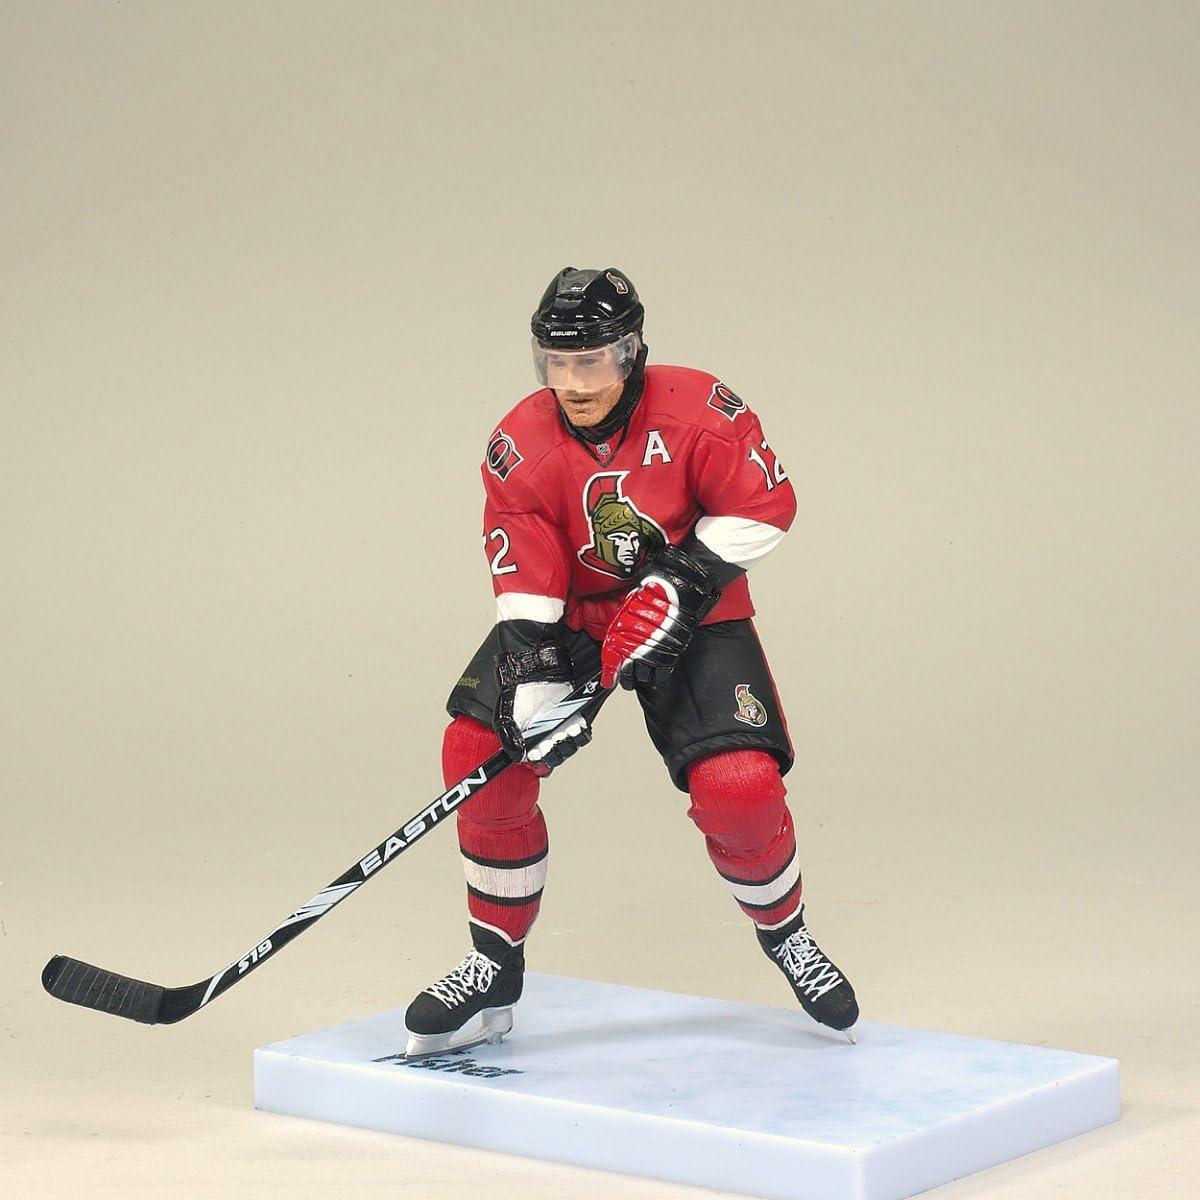 McFarlane Toys NHL Sports Picks Series 7 Al Macinnis Action Figure